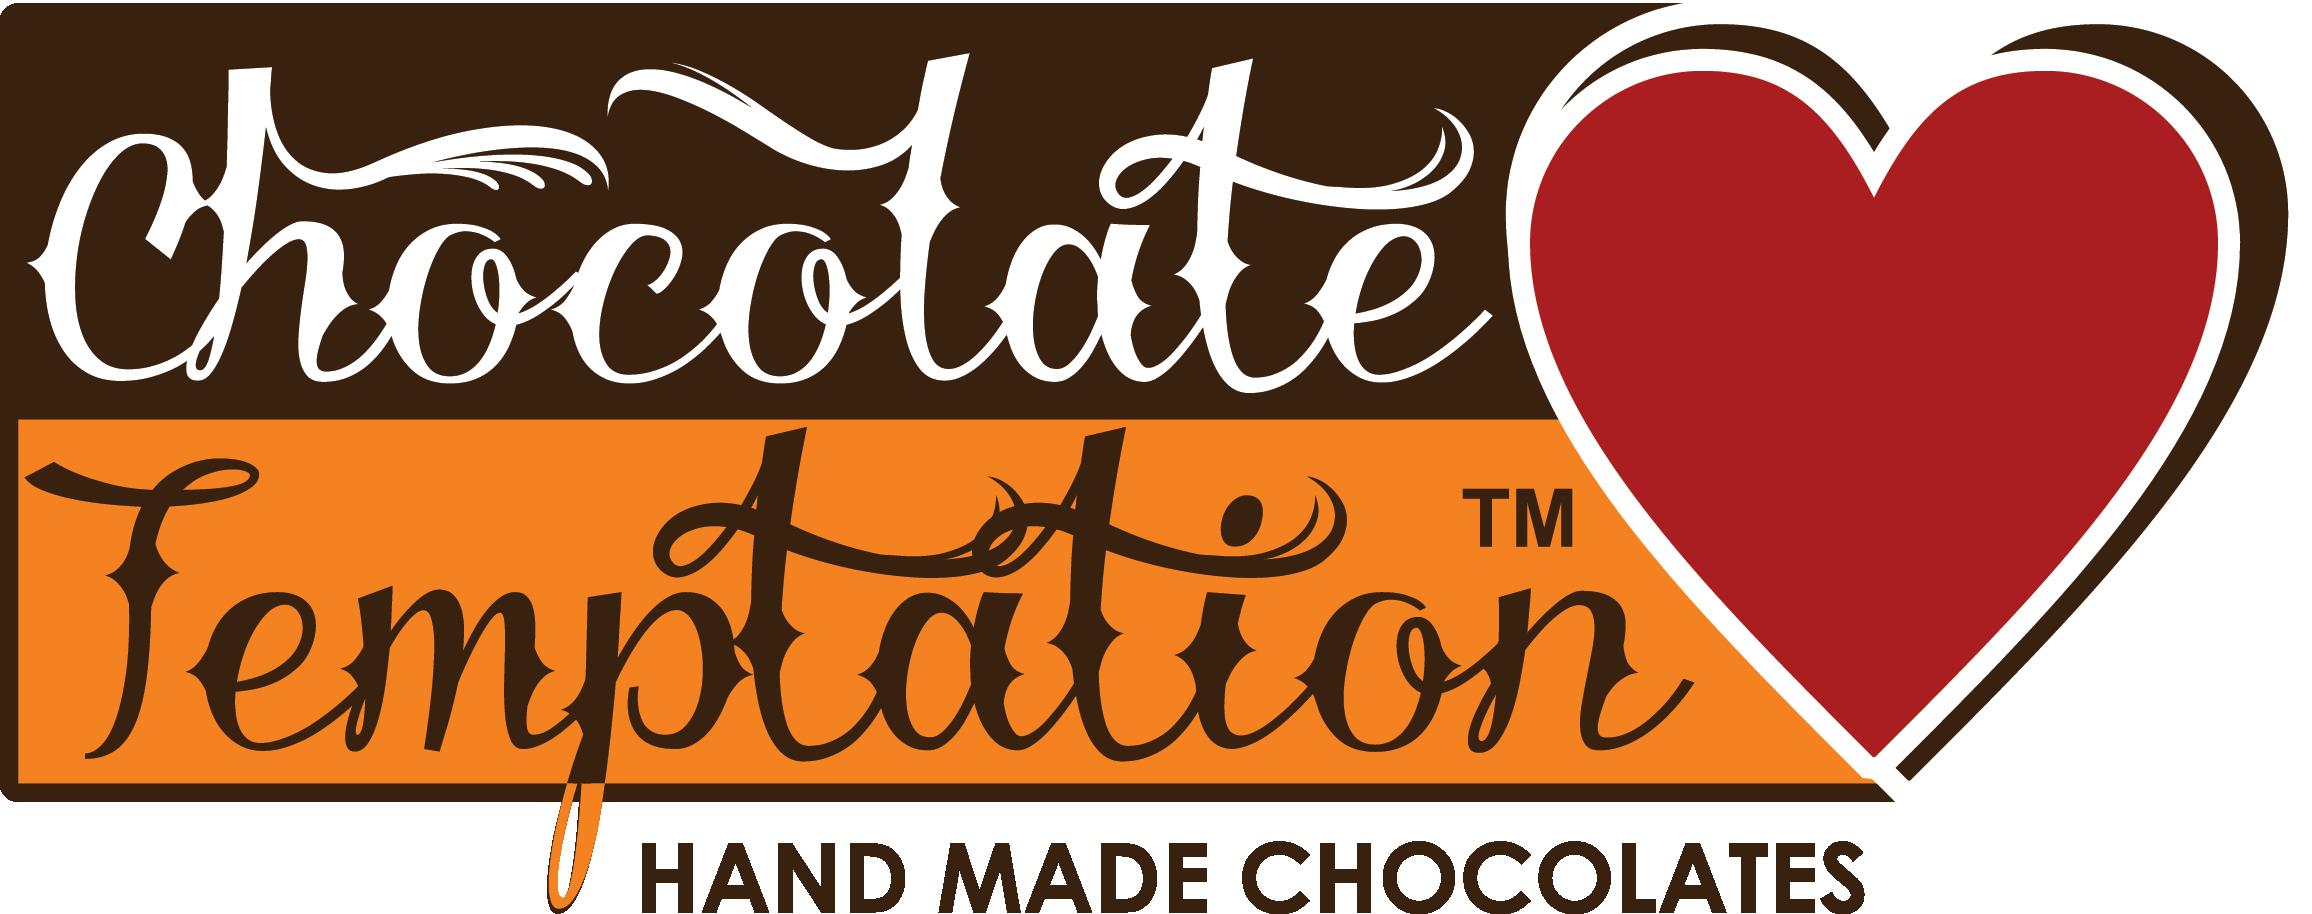 Chocolate Temptation +91-9871119902 - logo